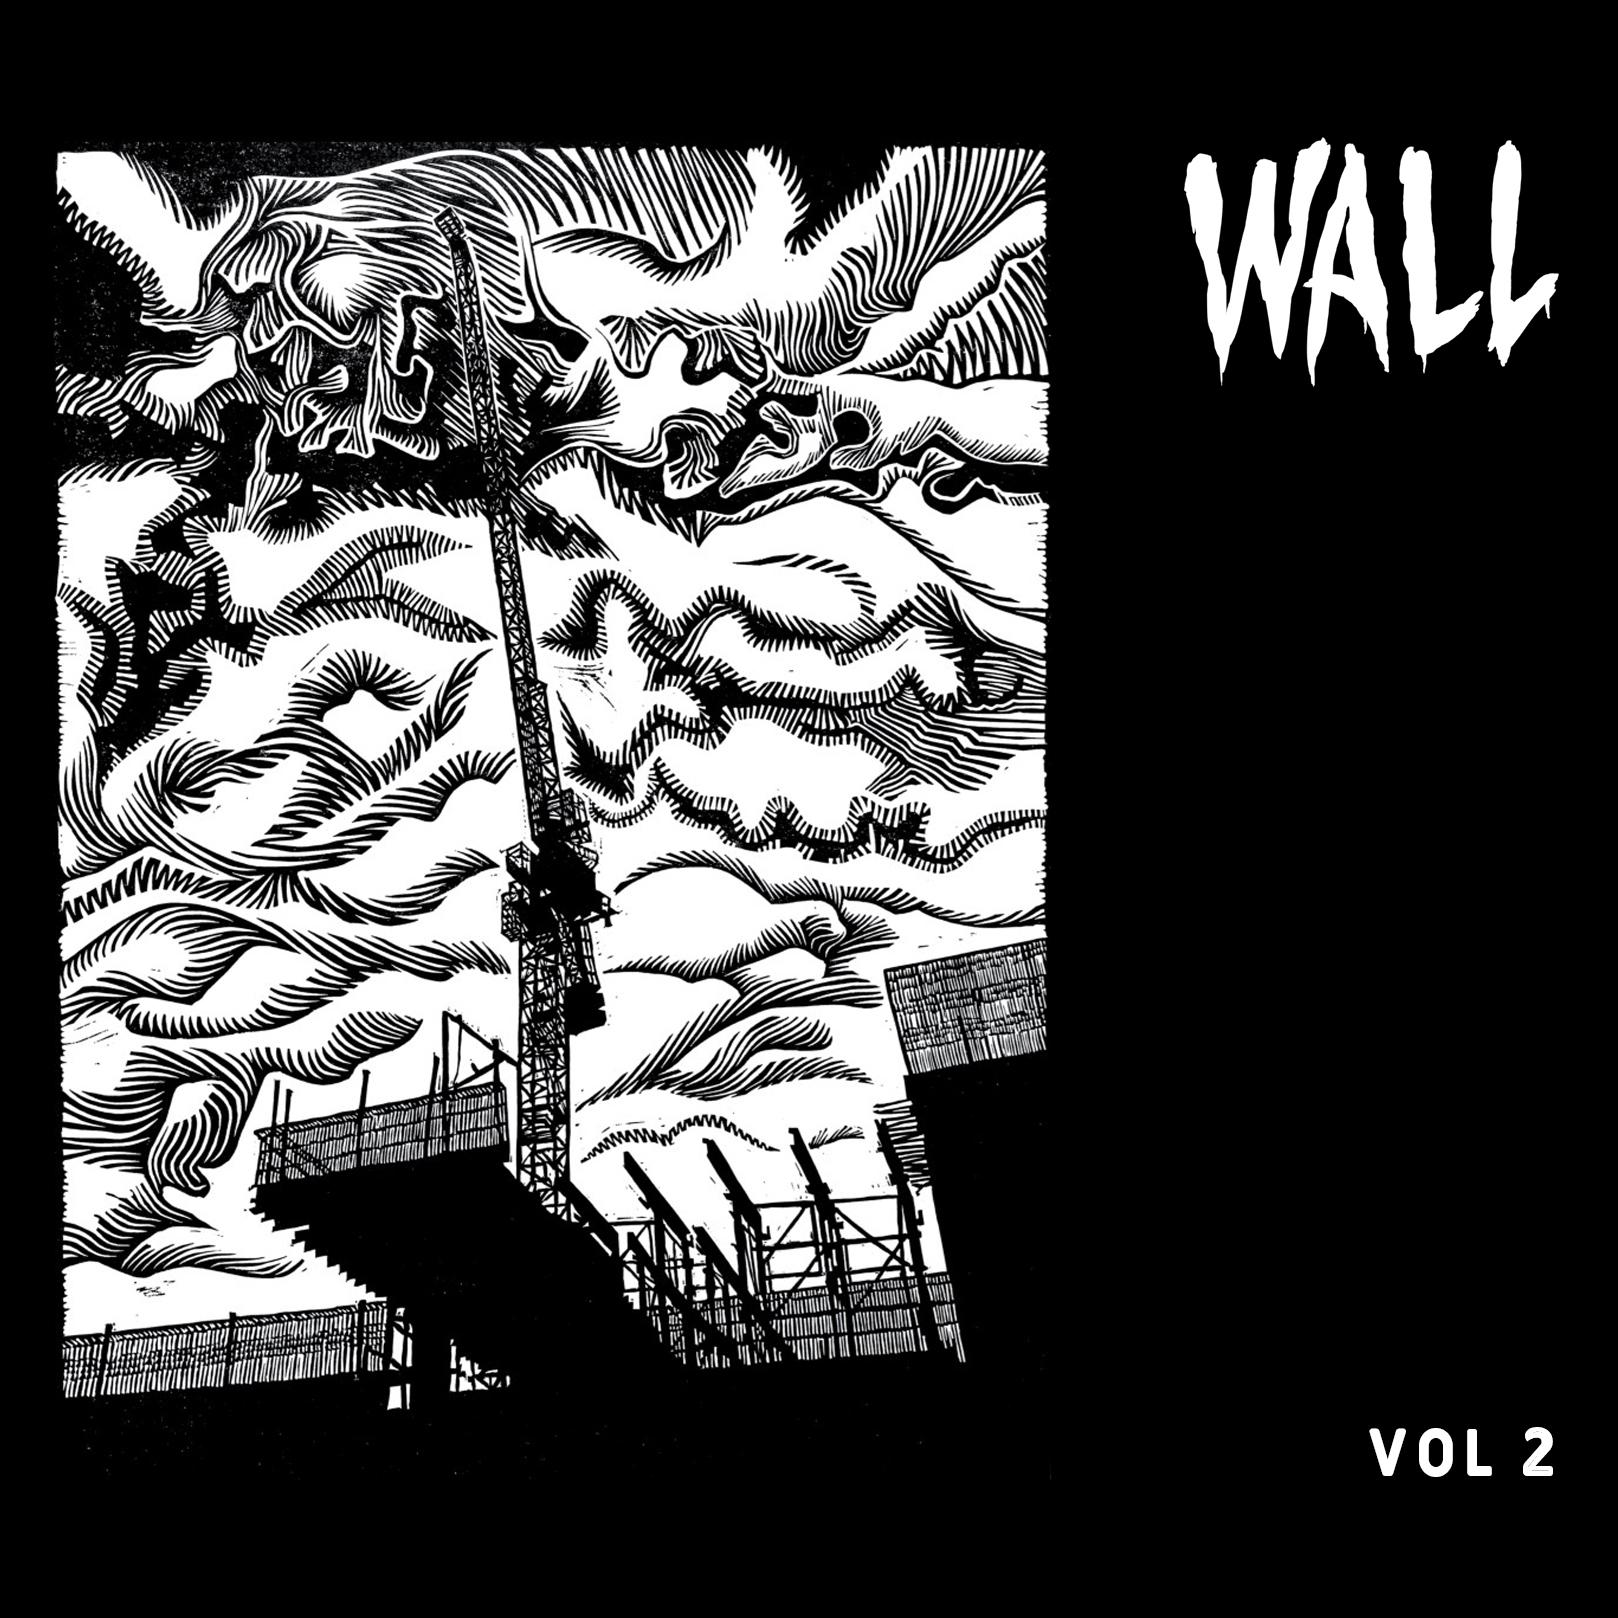 wall vol 2